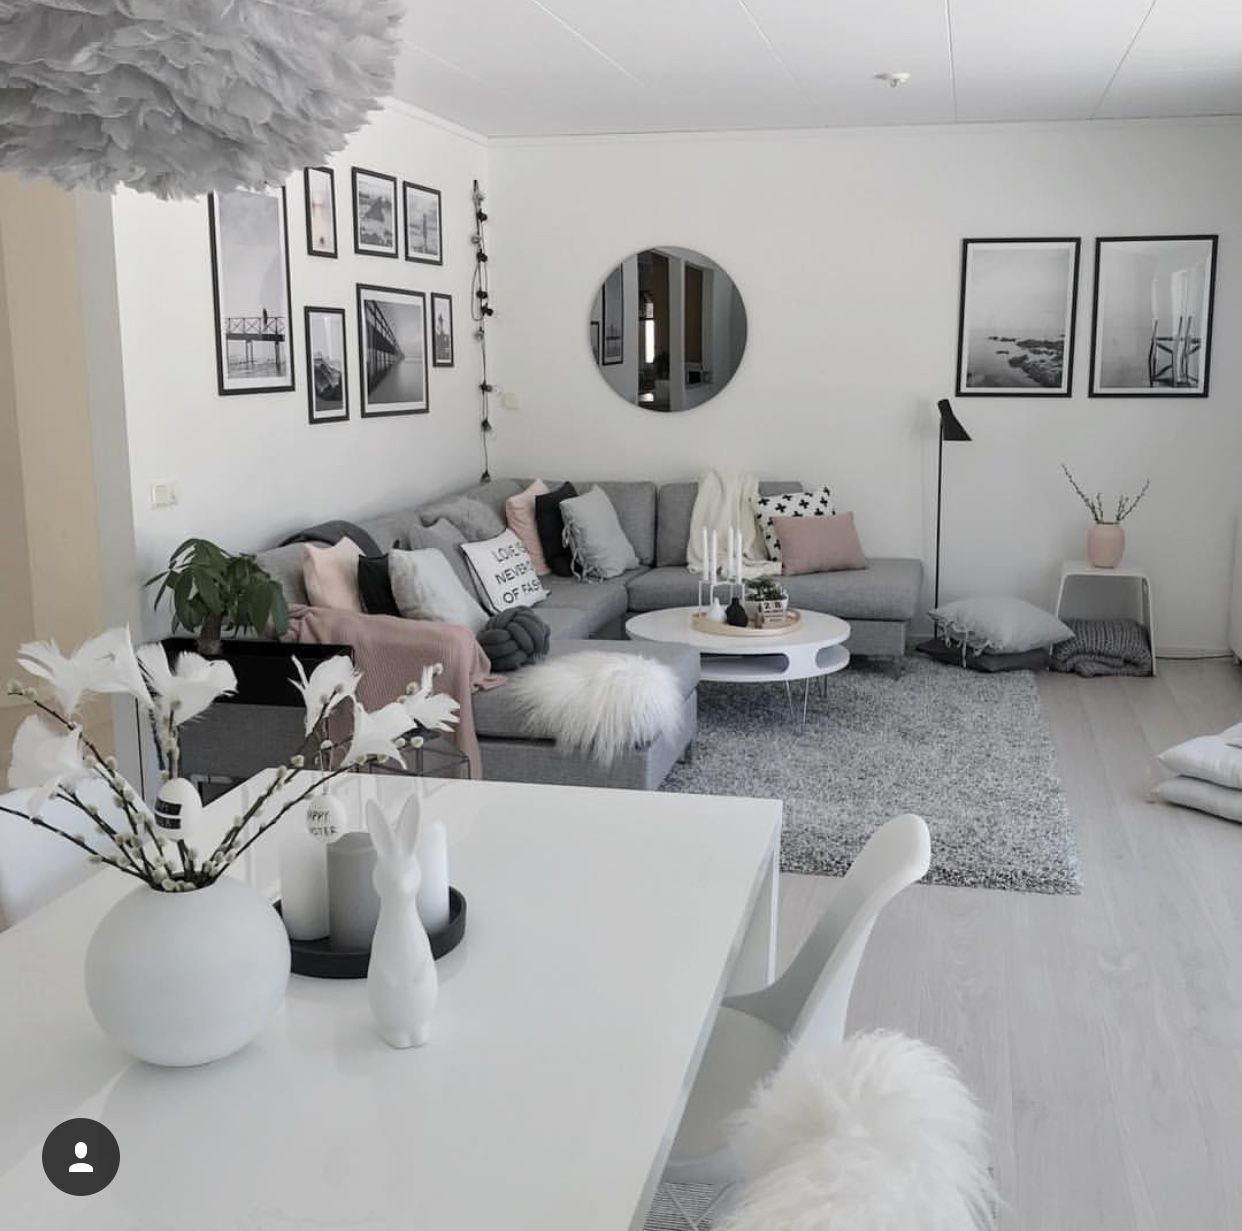 Pin by Matea on Interior design/ organization   White living room ...